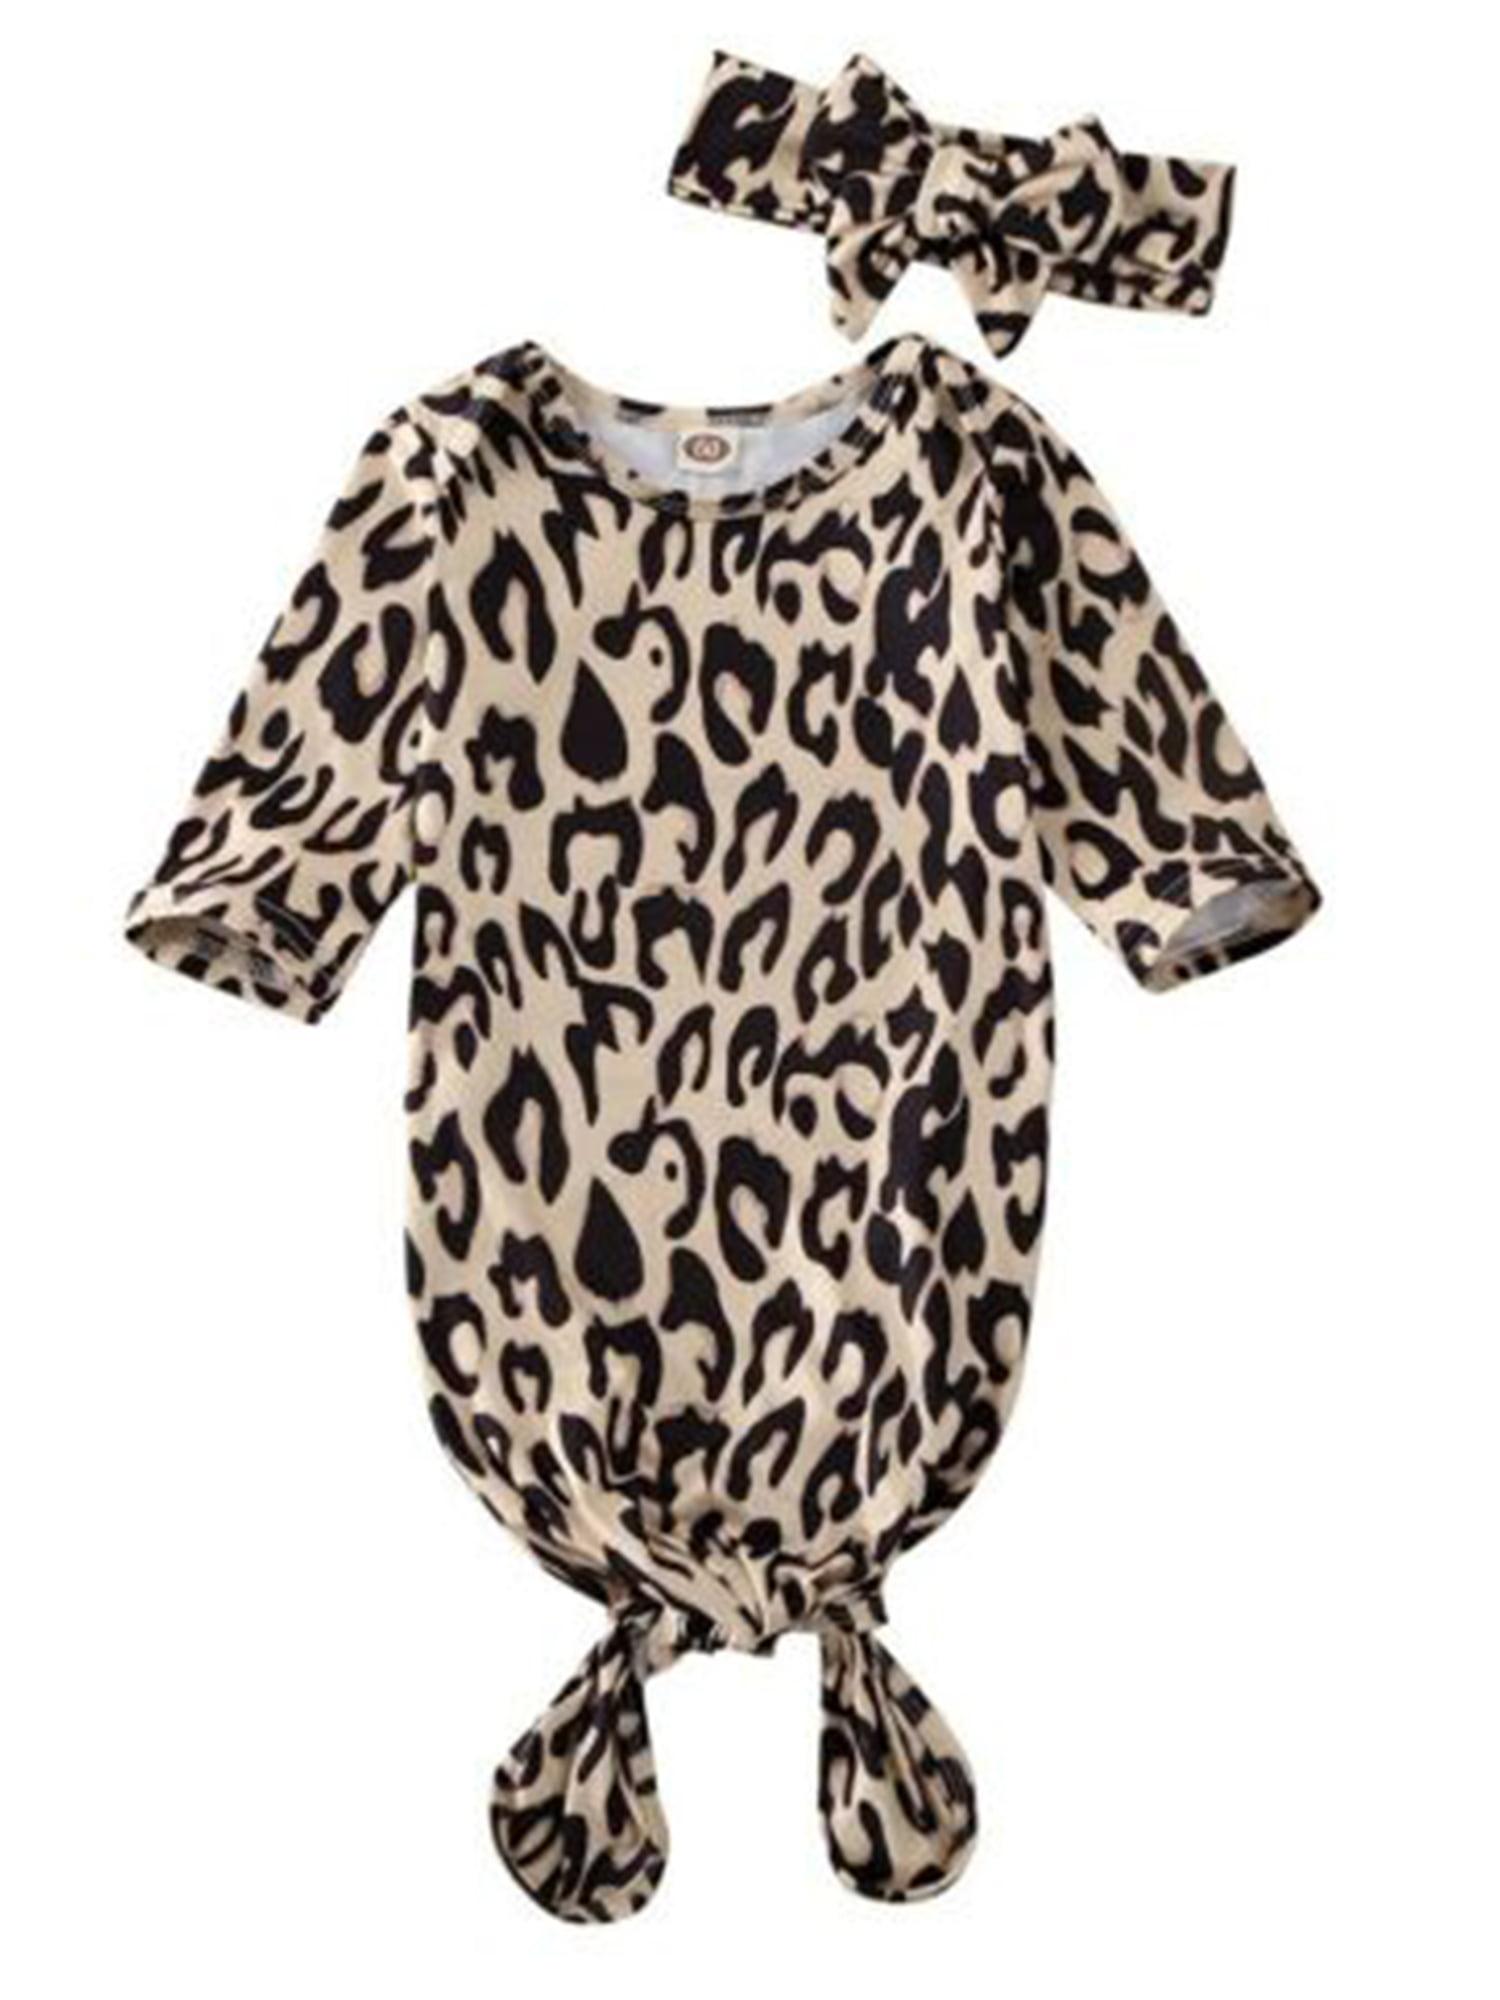 Unisex Newborn Baby Sleepwear Nightgrowns Swaddle Wrap Blanket Sleeping Bag+Headband Outfit Set